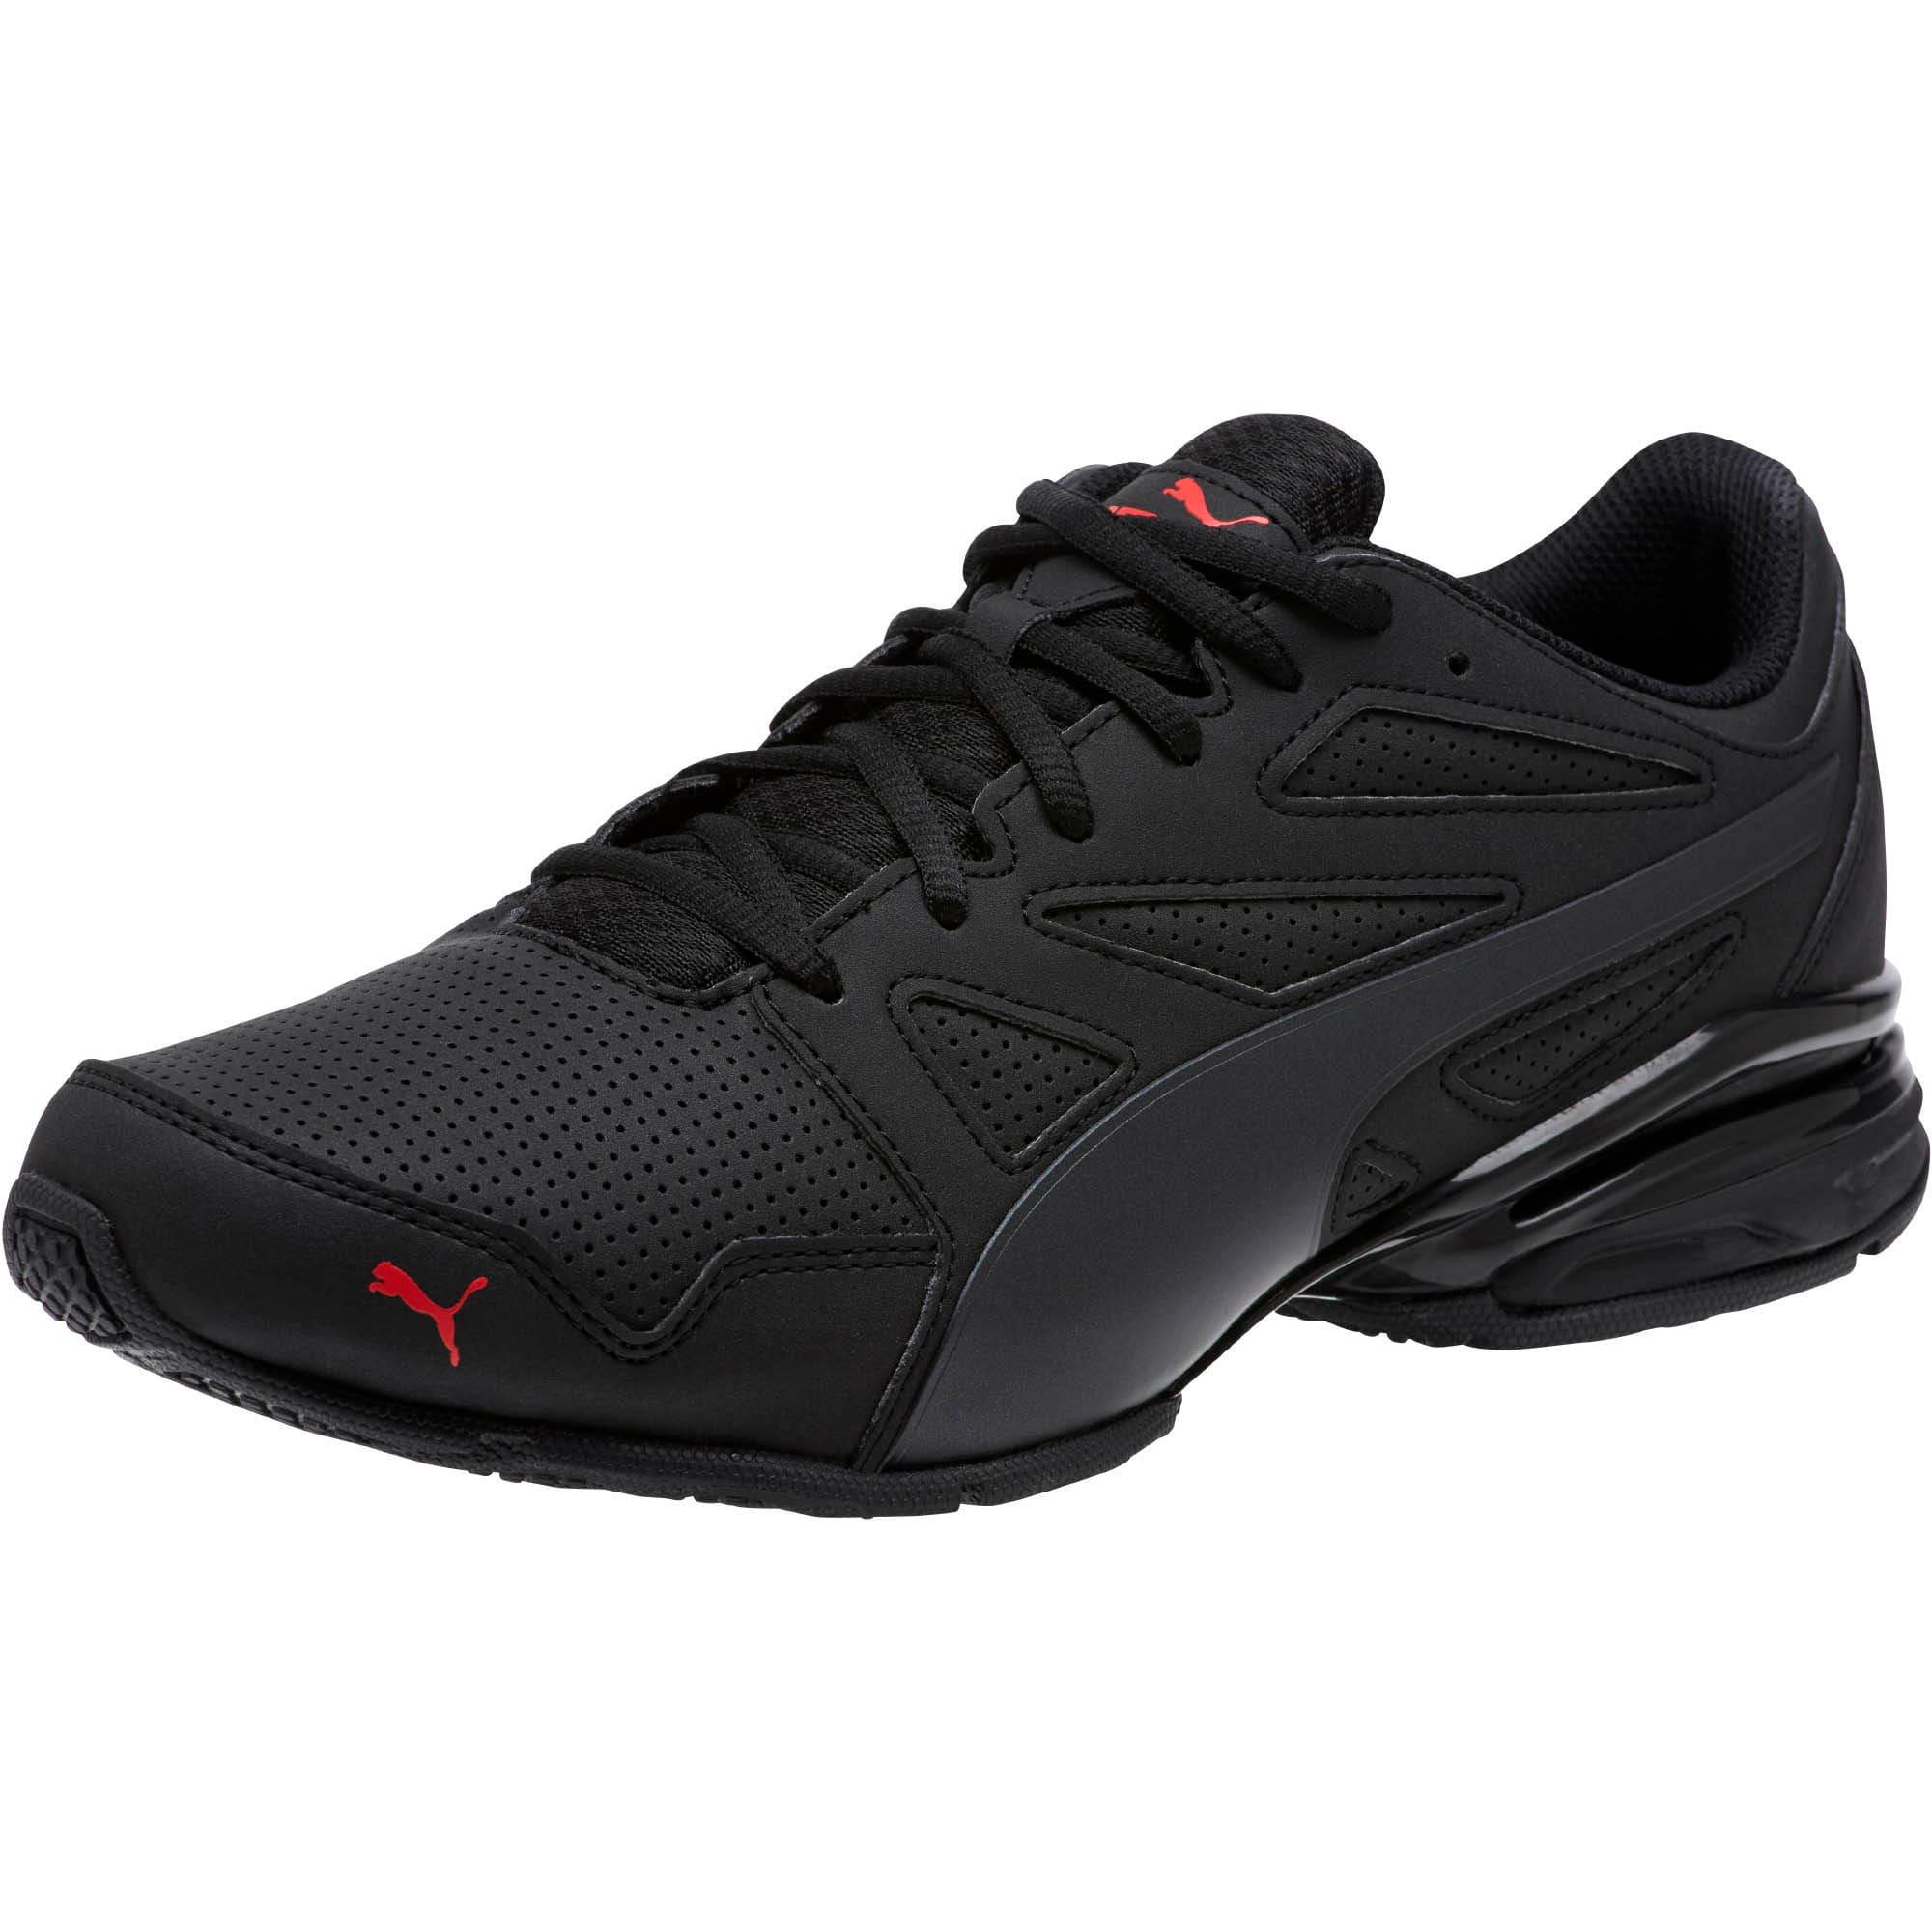 PUMA Men's Enzin SL Sneaker, White Black, 11 M US: